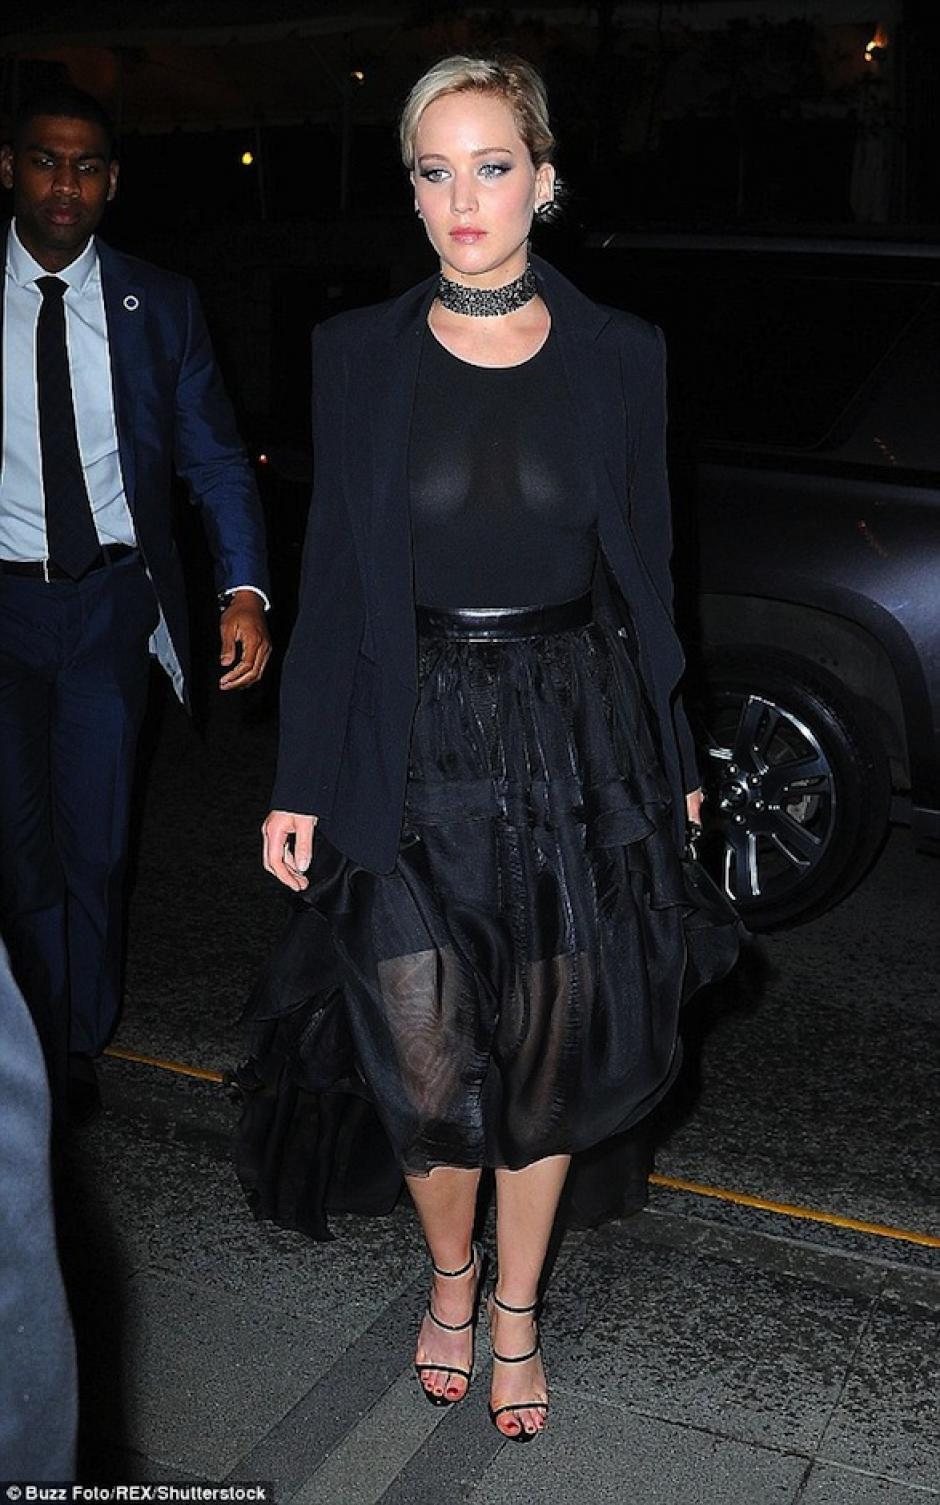 Jennifer iba acompañada de sus guardaespaldas. (Foto: Mail Online)